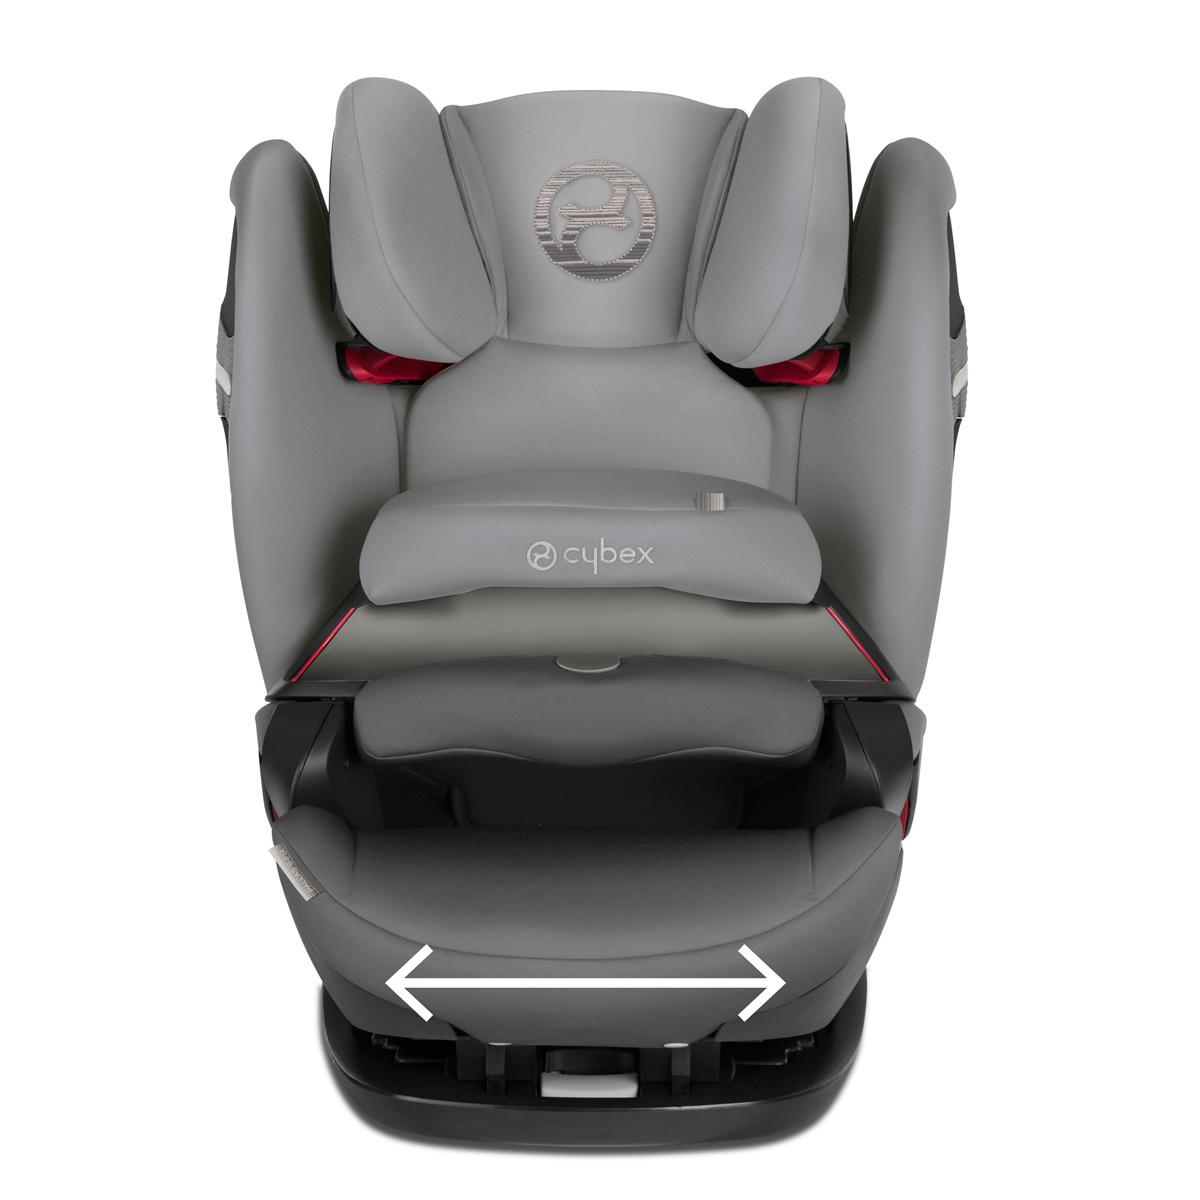 cybex si ge auto pallas s fix isofix groupe 1 2 3 manhattan grey si ge auto et coque cybex. Black Bedroom Furniture Sets. Home Design Ideas